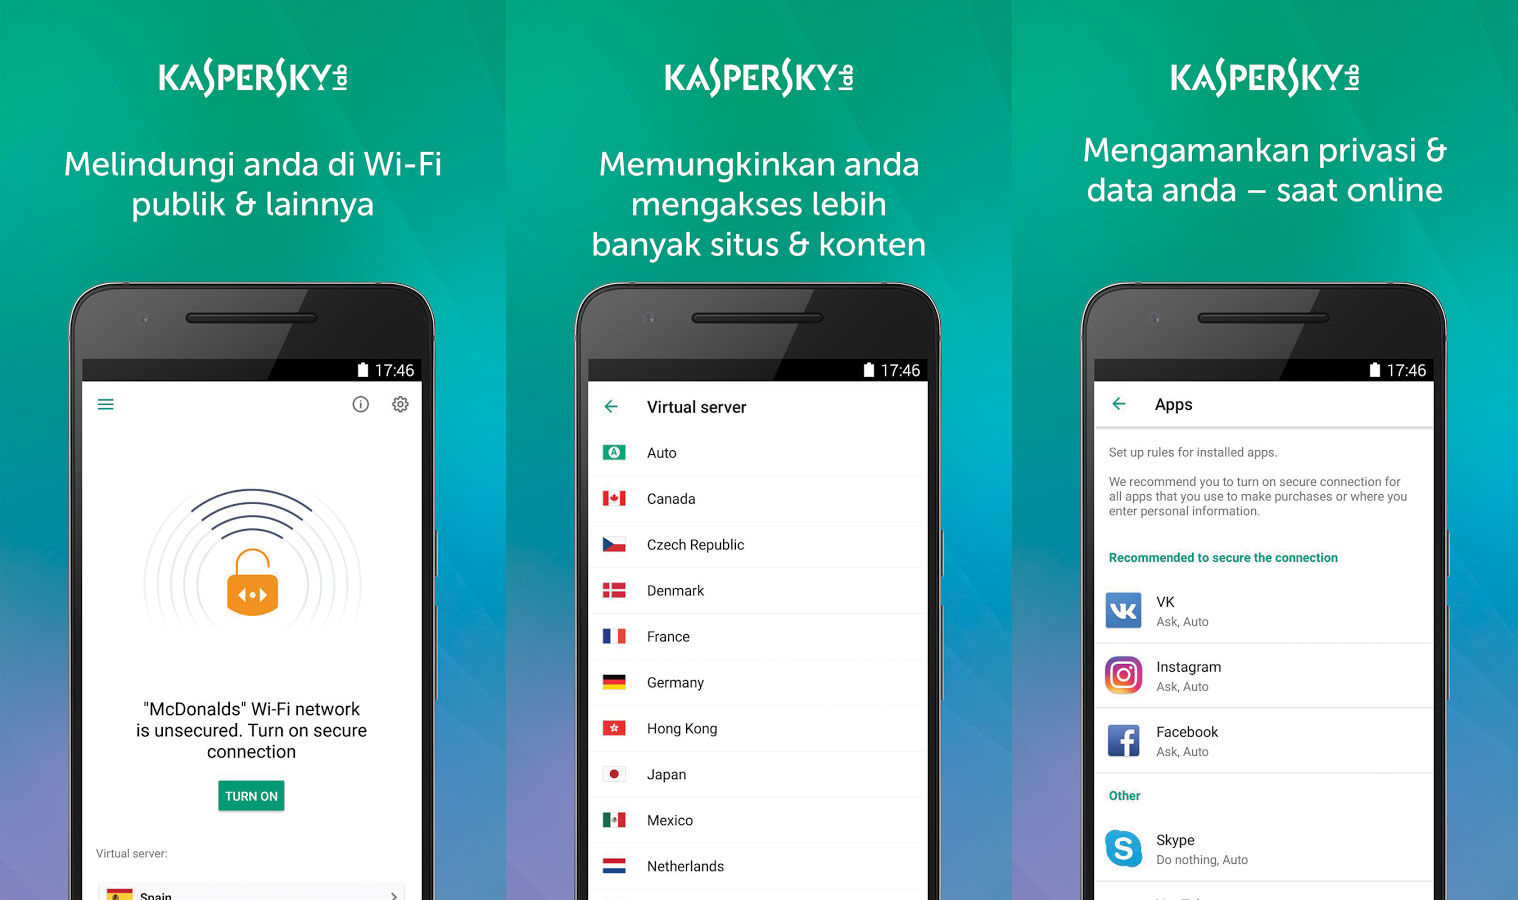 10 Aplikasi Android Gratis Terbaik Edisi 2017 Jalantikus Com